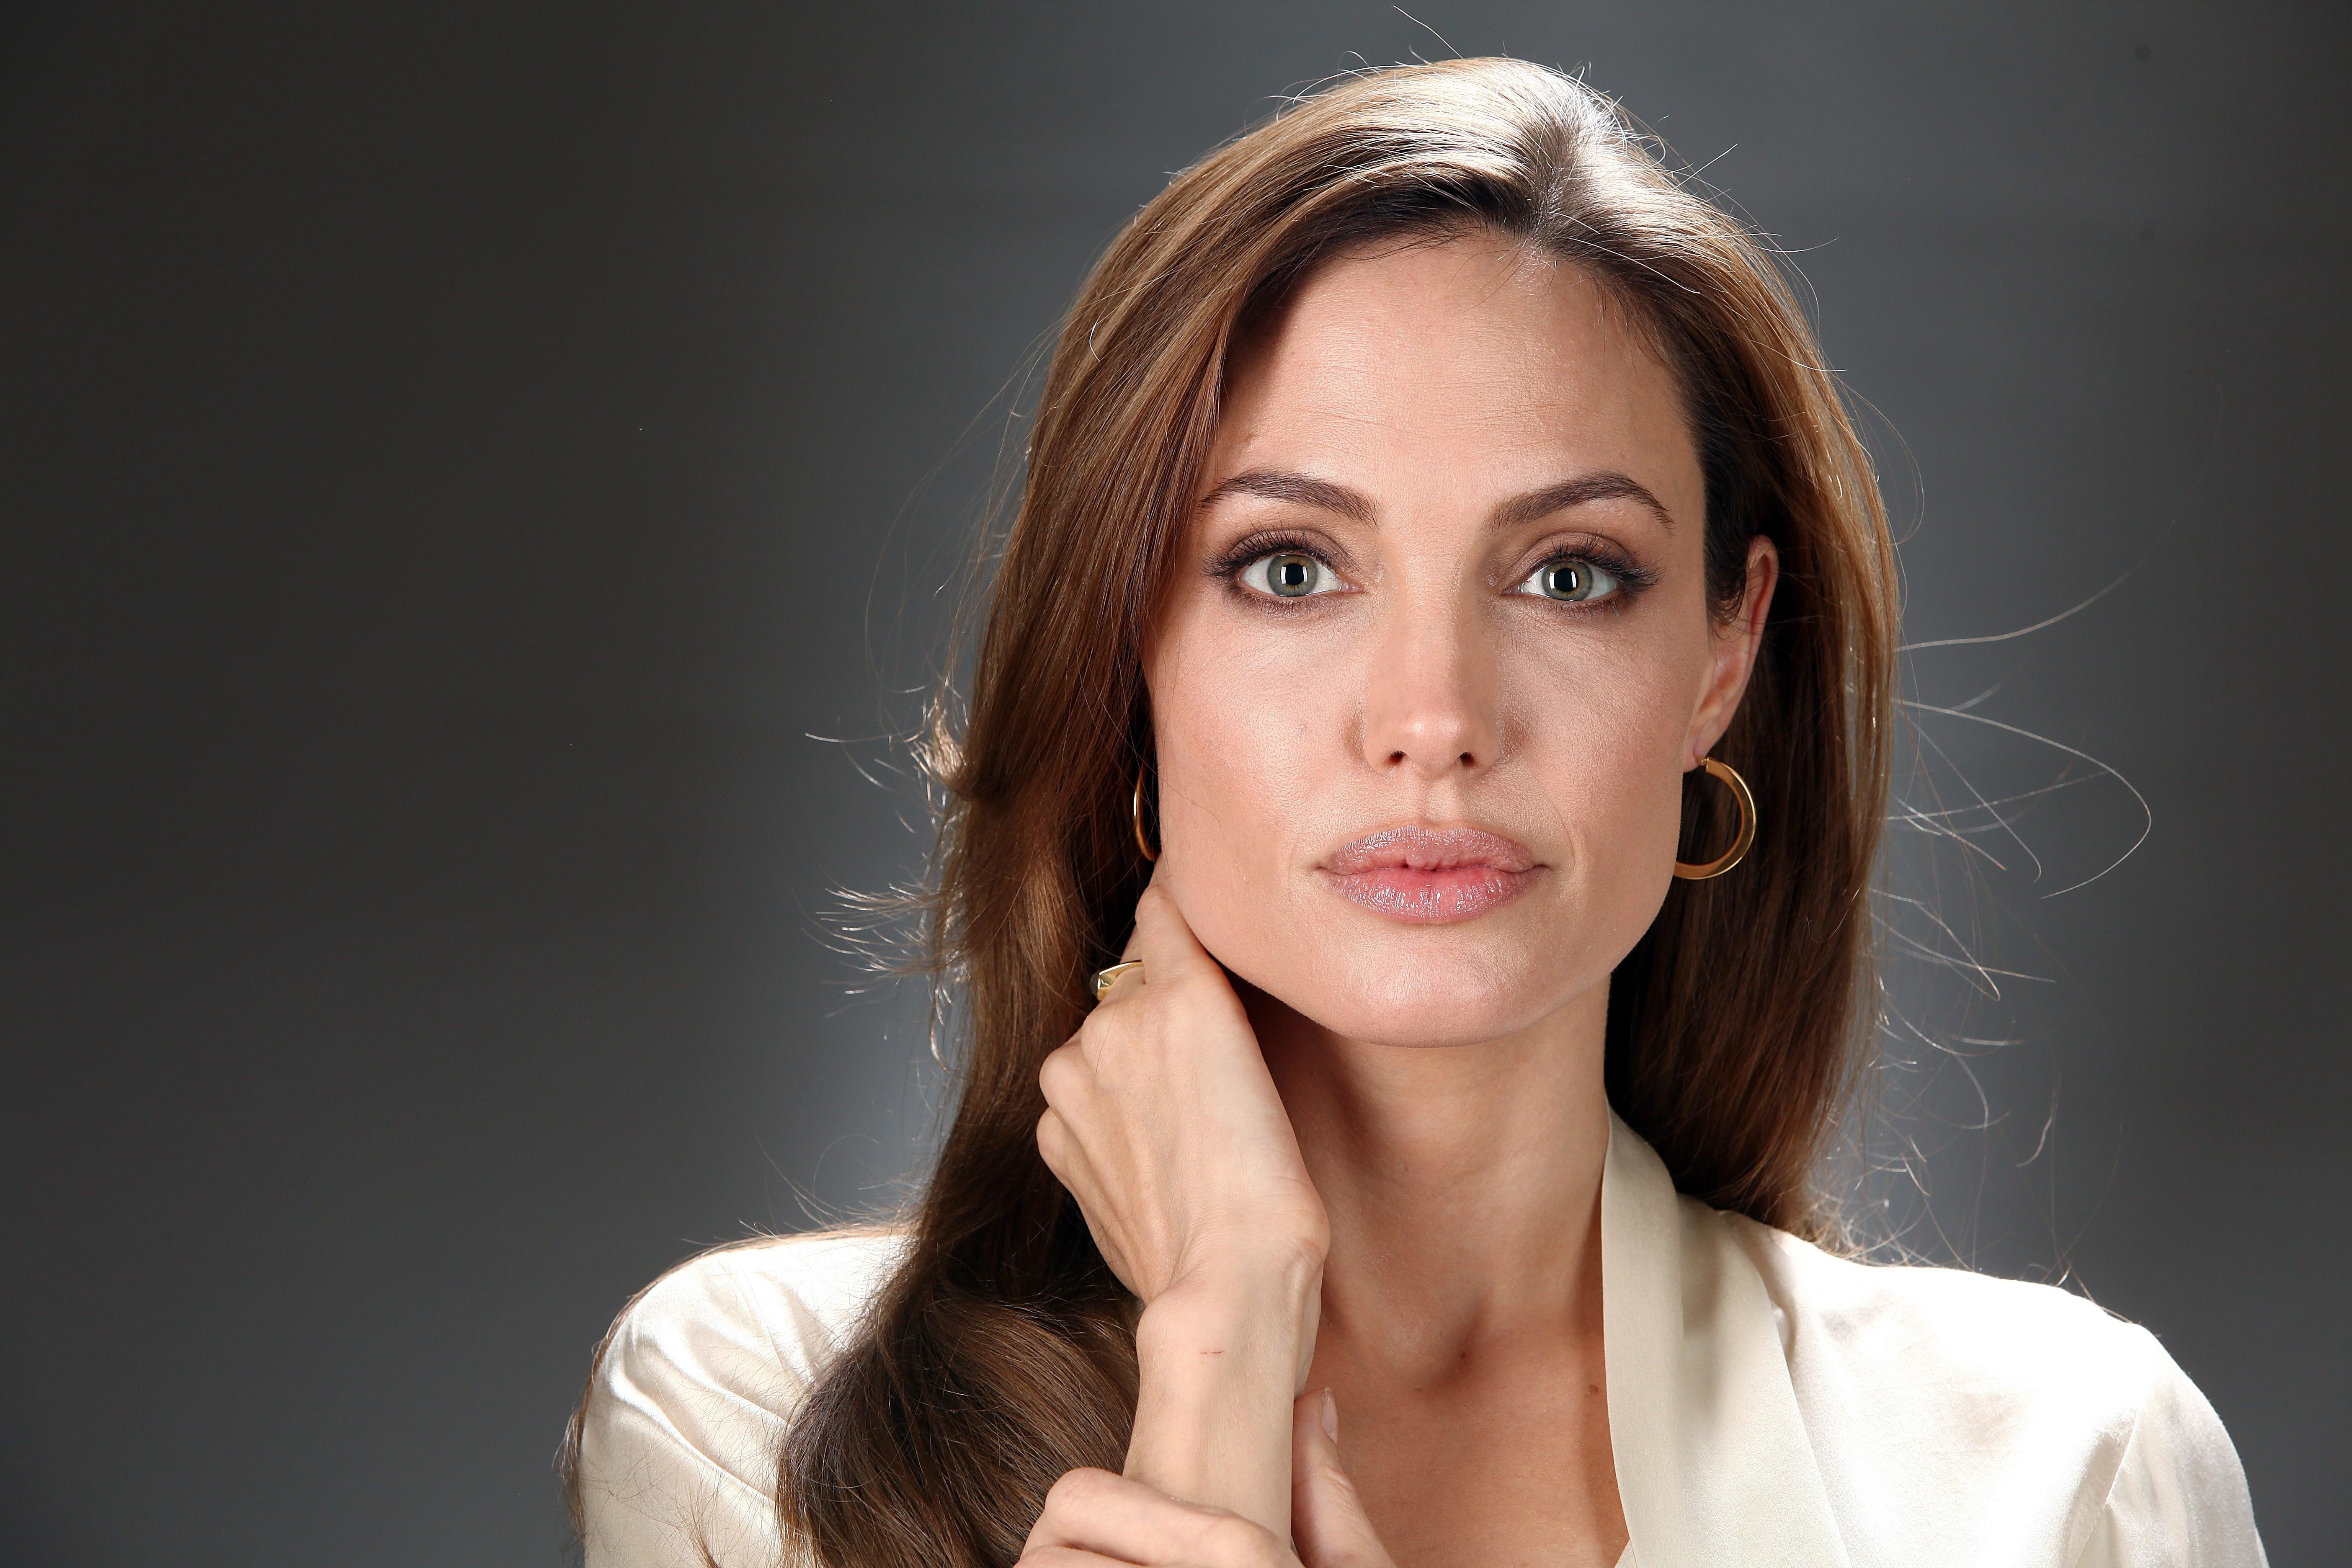 Angelina Jolie: Angelina Jolie Net Worth, Bio 2017-2016, Wiki